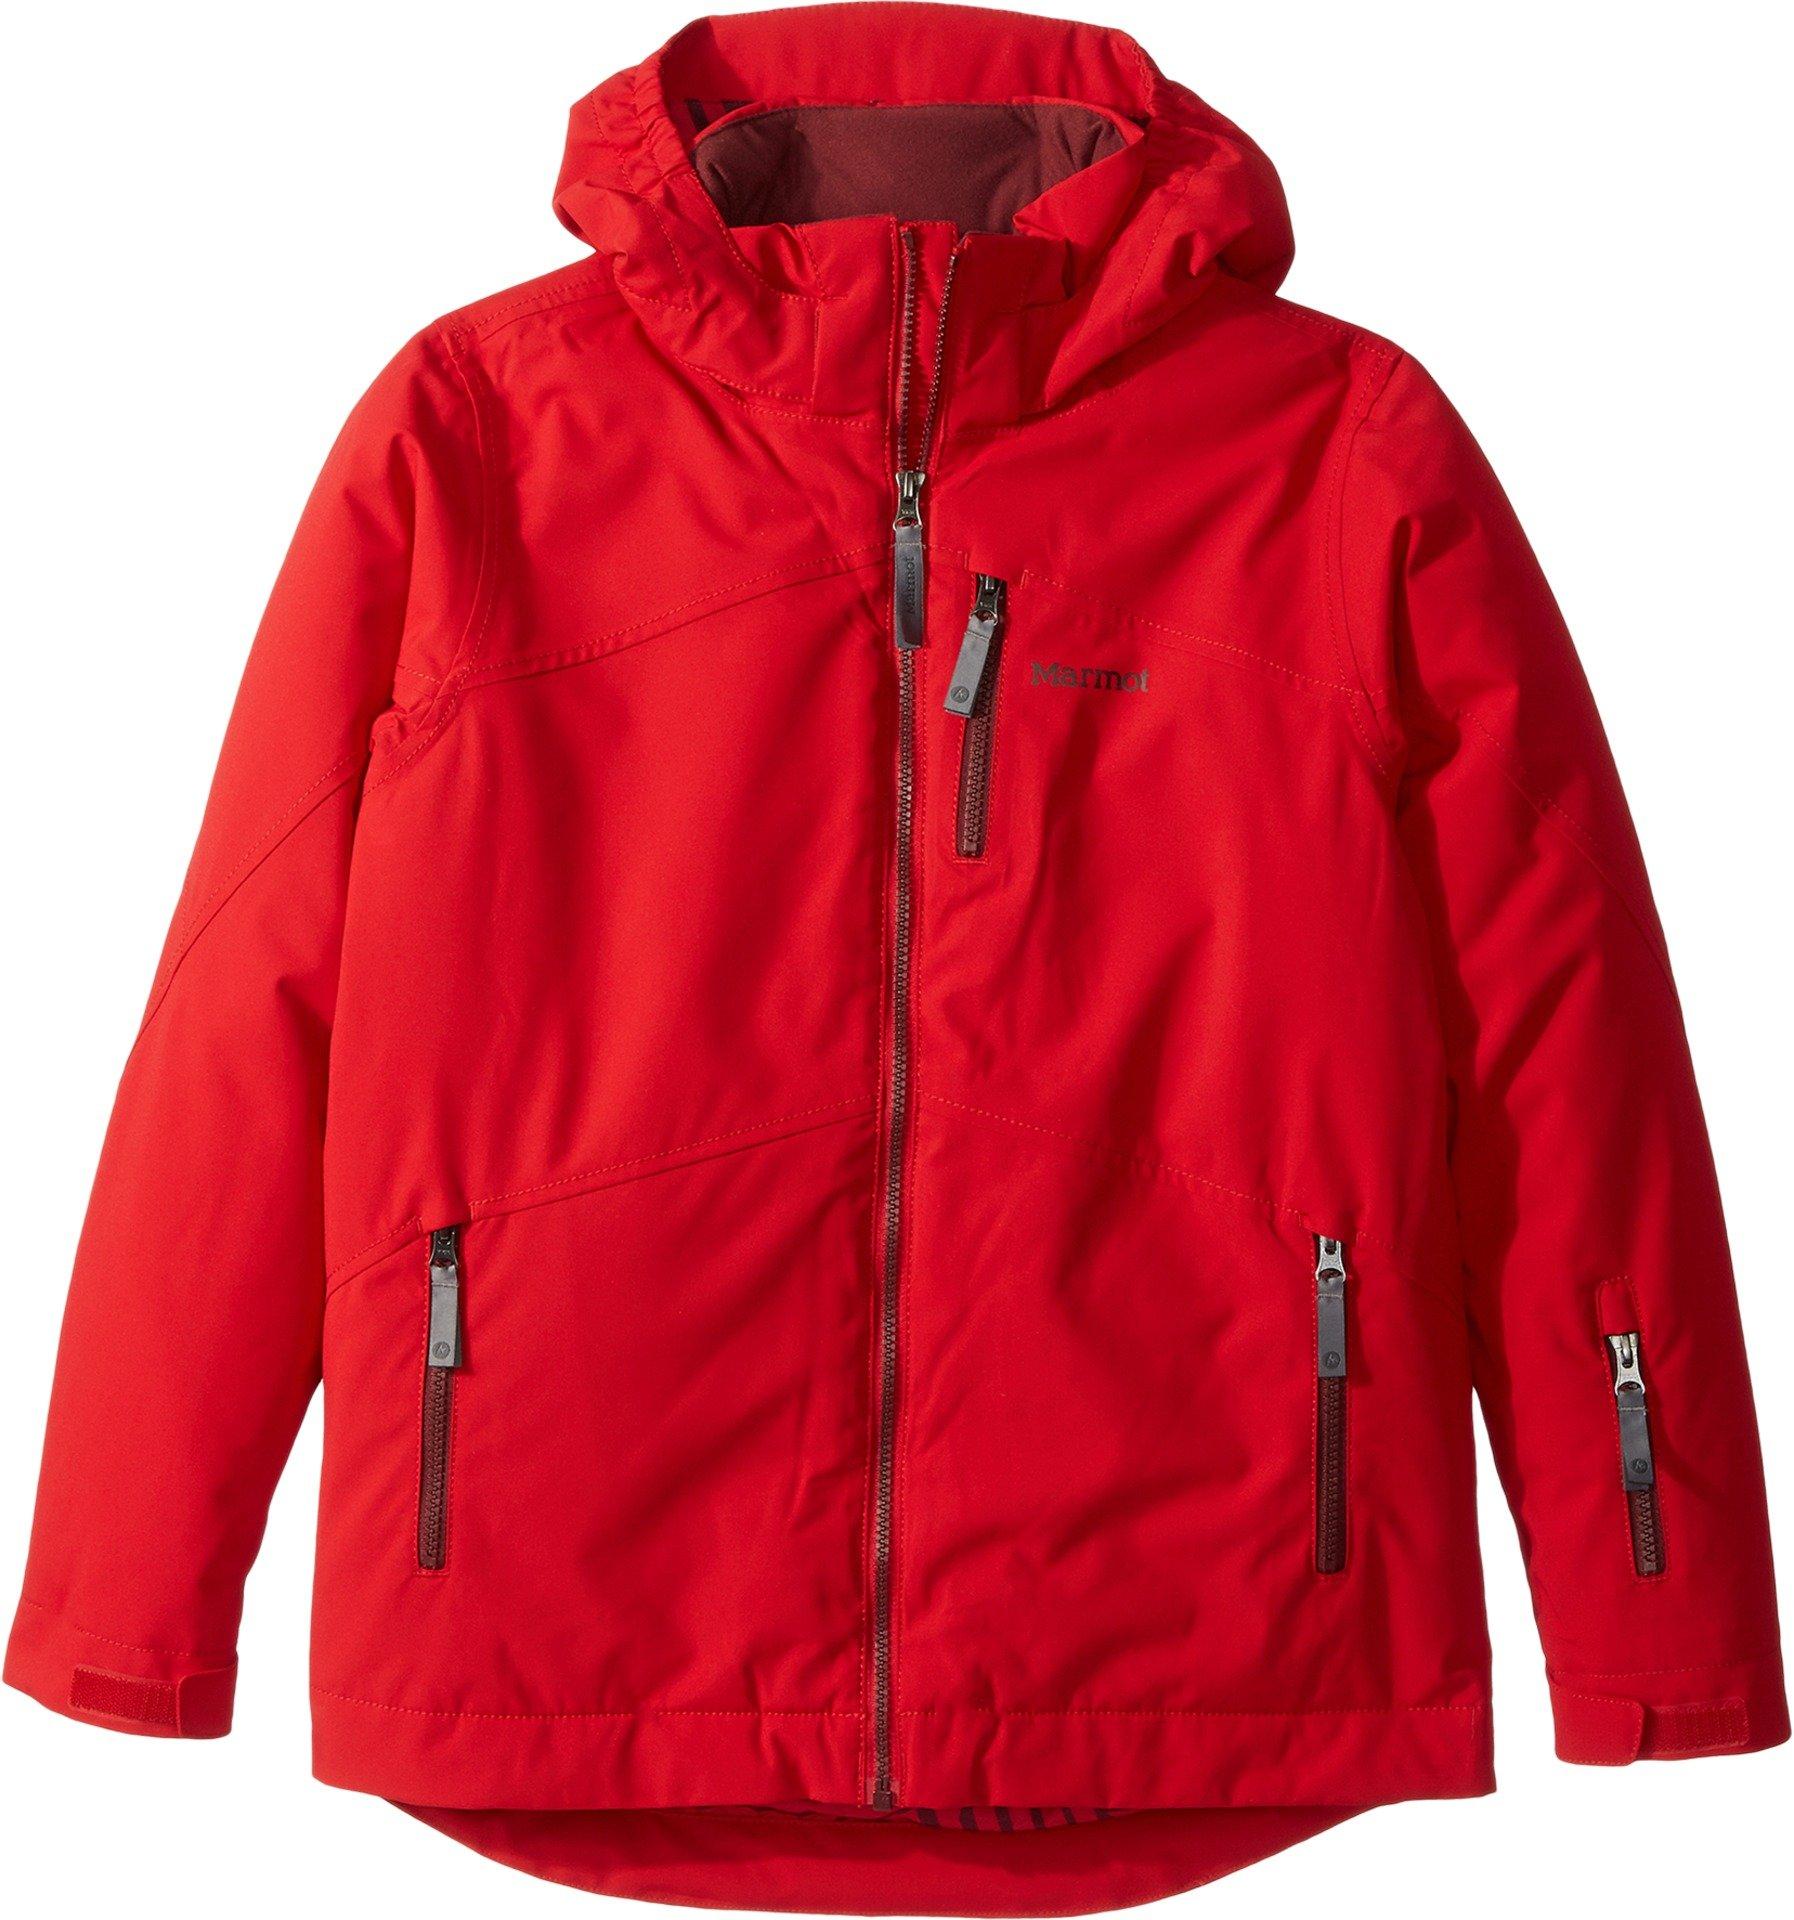 Marmot Kids Boy's Ripsaw Jacket (Little Kids/Big Kids) Team Red Large by Marmot